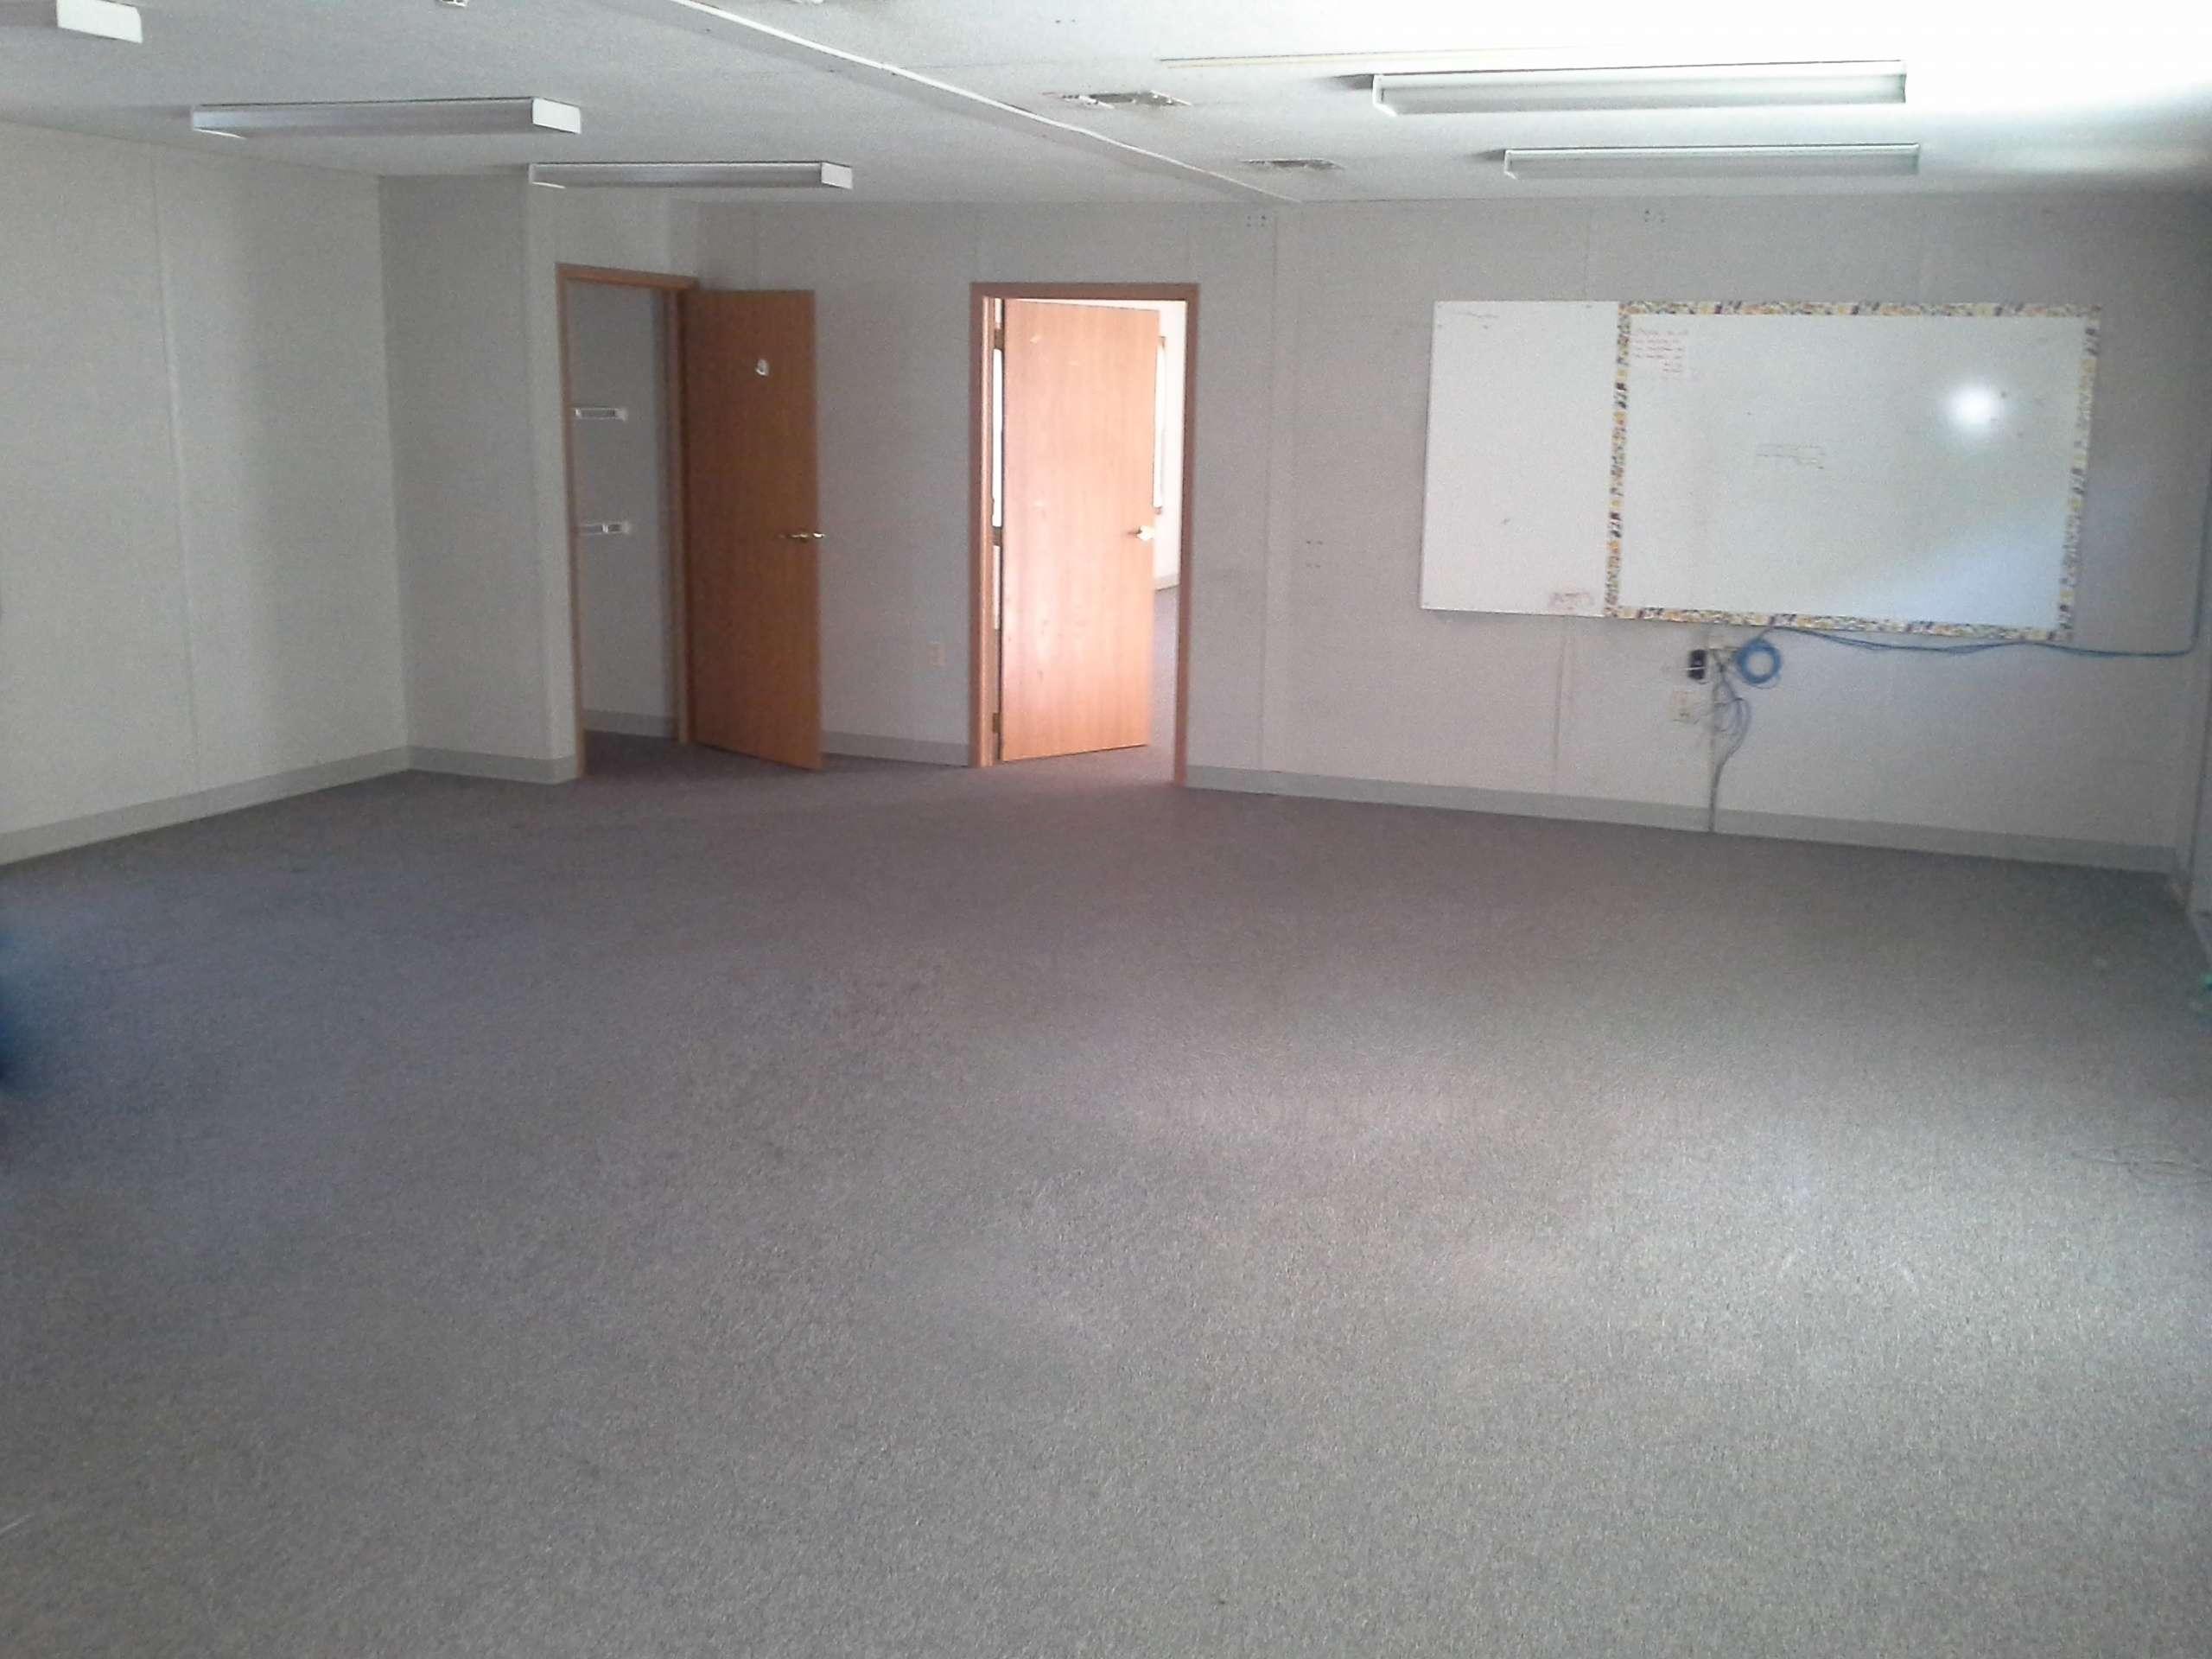 Modular Classroom Llc ~ Floor plans modular classrooms llc